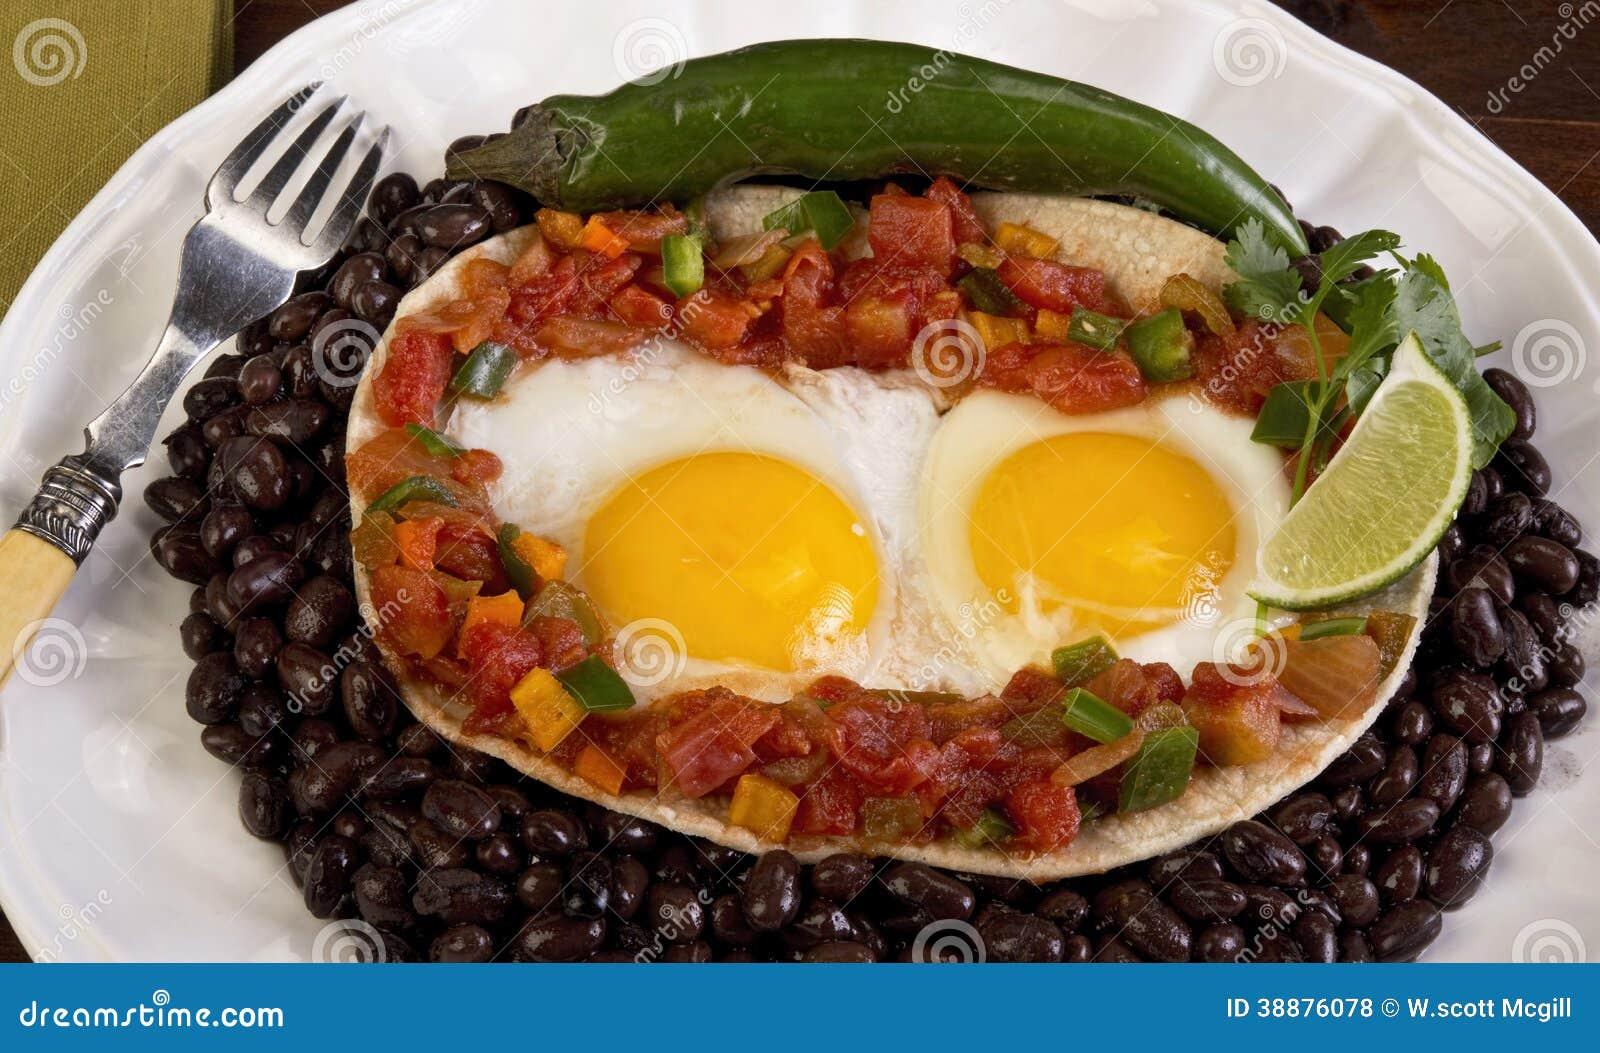 Très Petit Déjeuner Mexicain. Photo stock - Image: 38876078 BM45